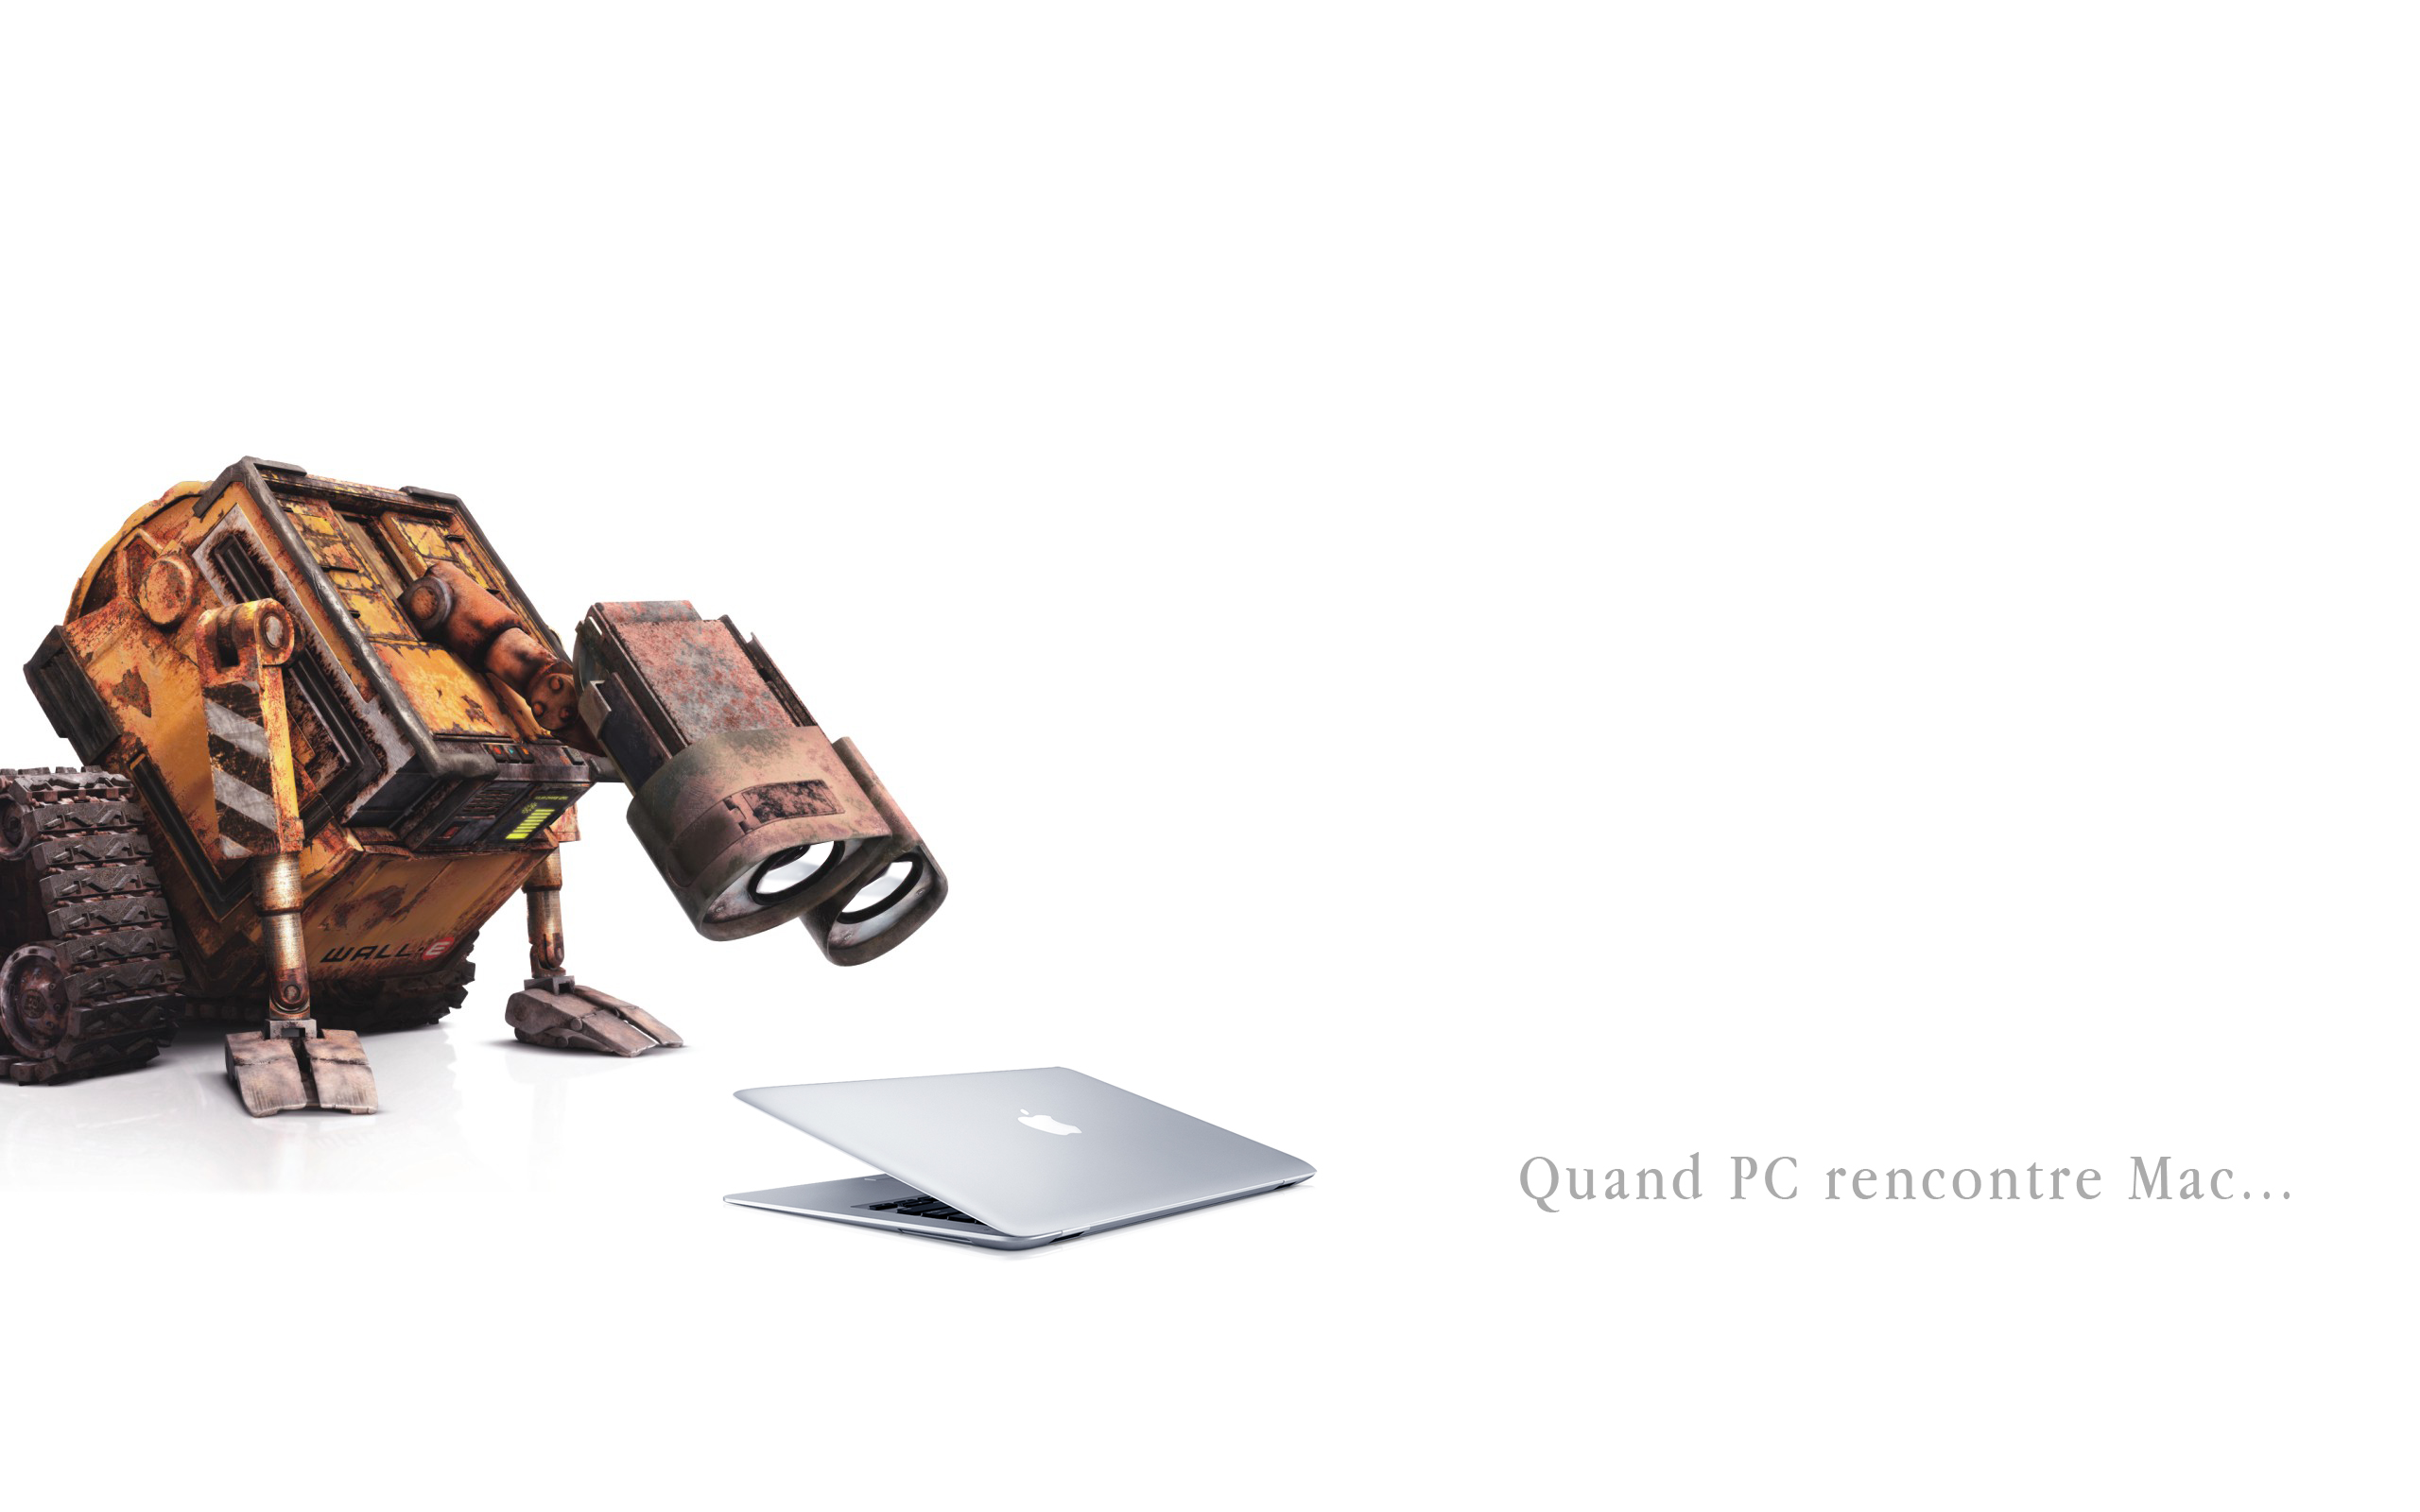 Fonds d'écran Informatique Apple Quand un PC rencontre un Mac